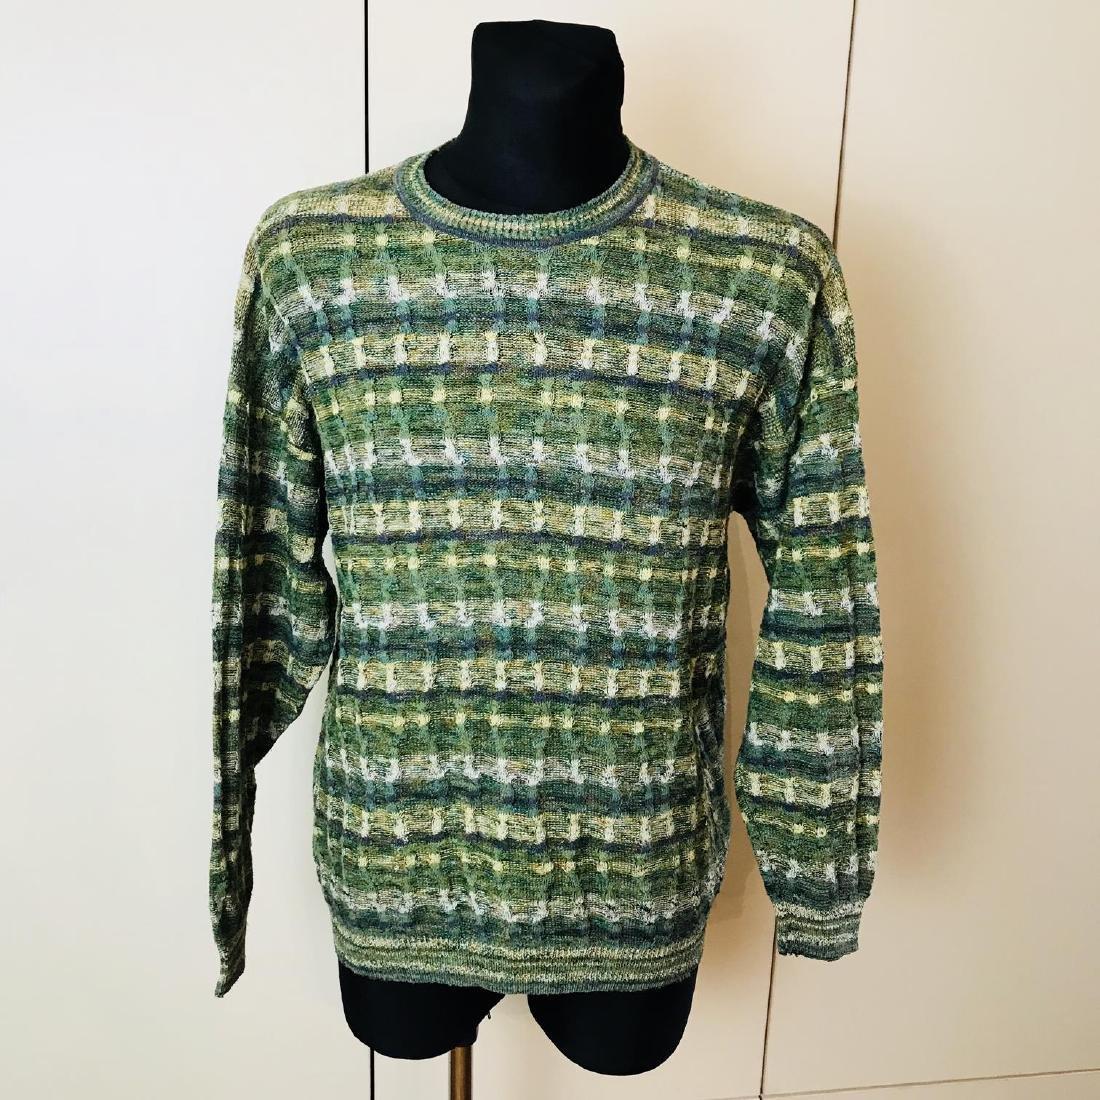 Vintage Men's Italian Designer Sweater Size 44 US 54 EU